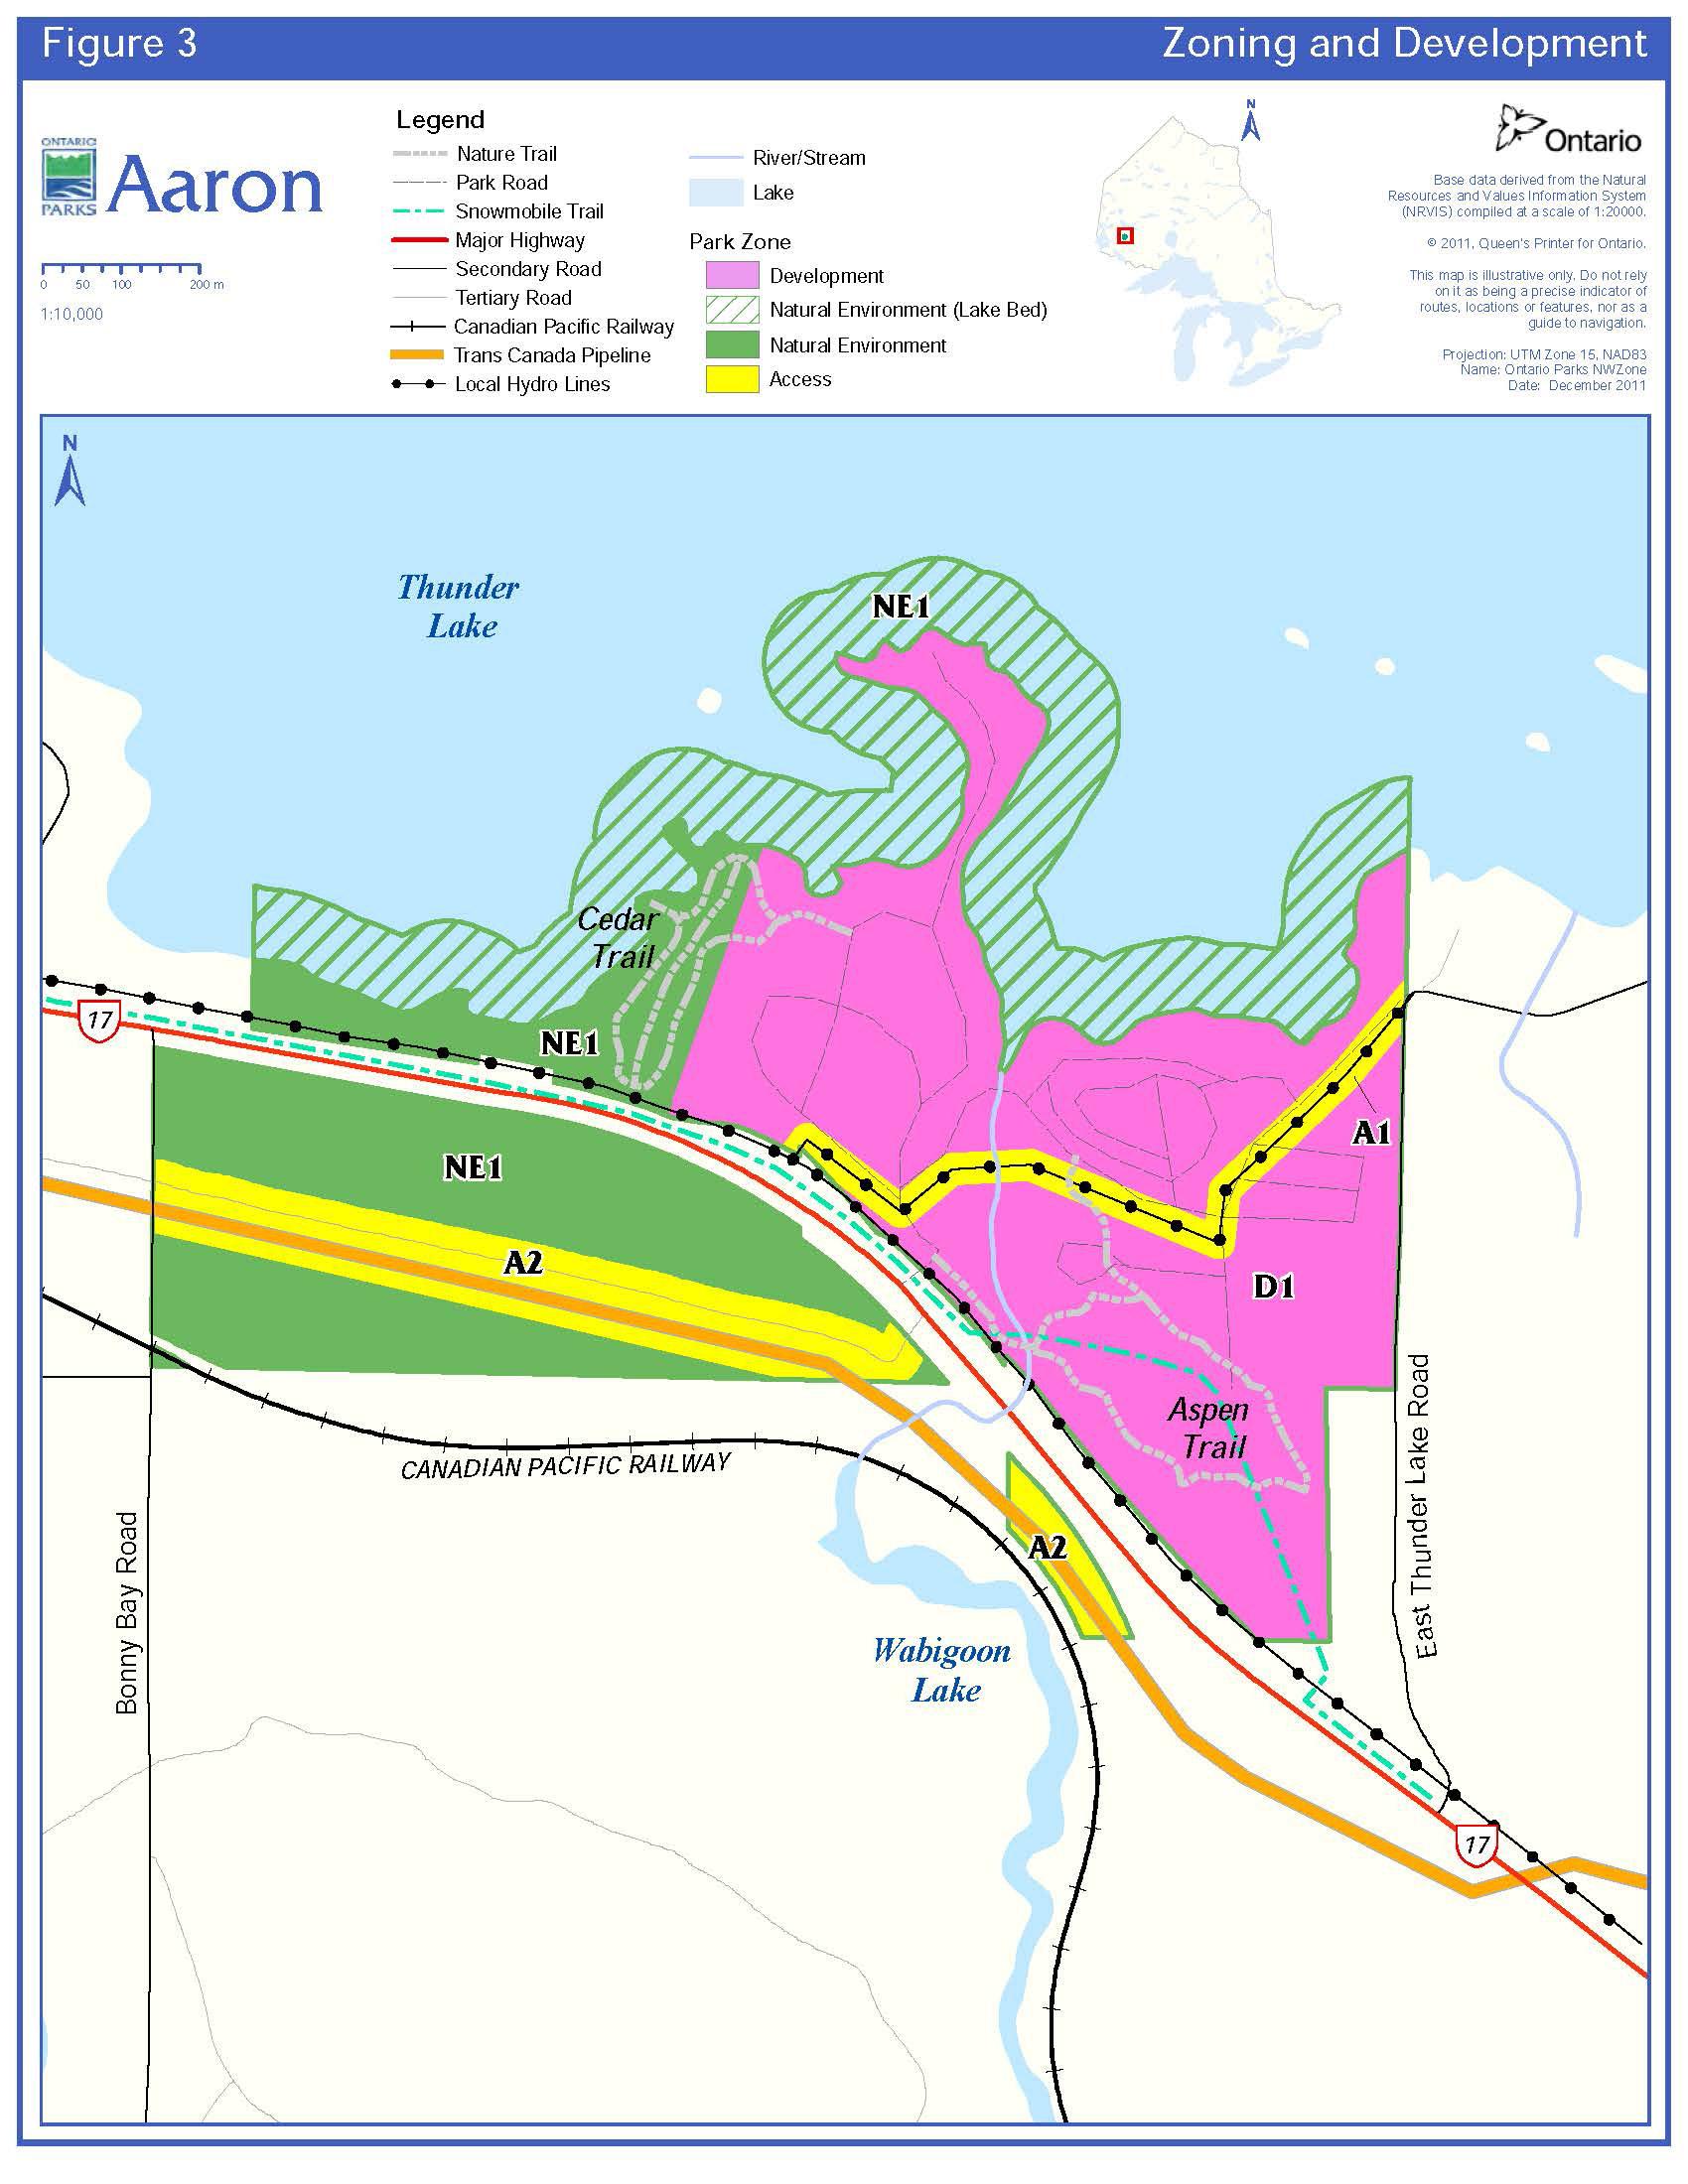 Aaron provincial park management plan ontario enlarge figure 3 zoning and development pooptronica